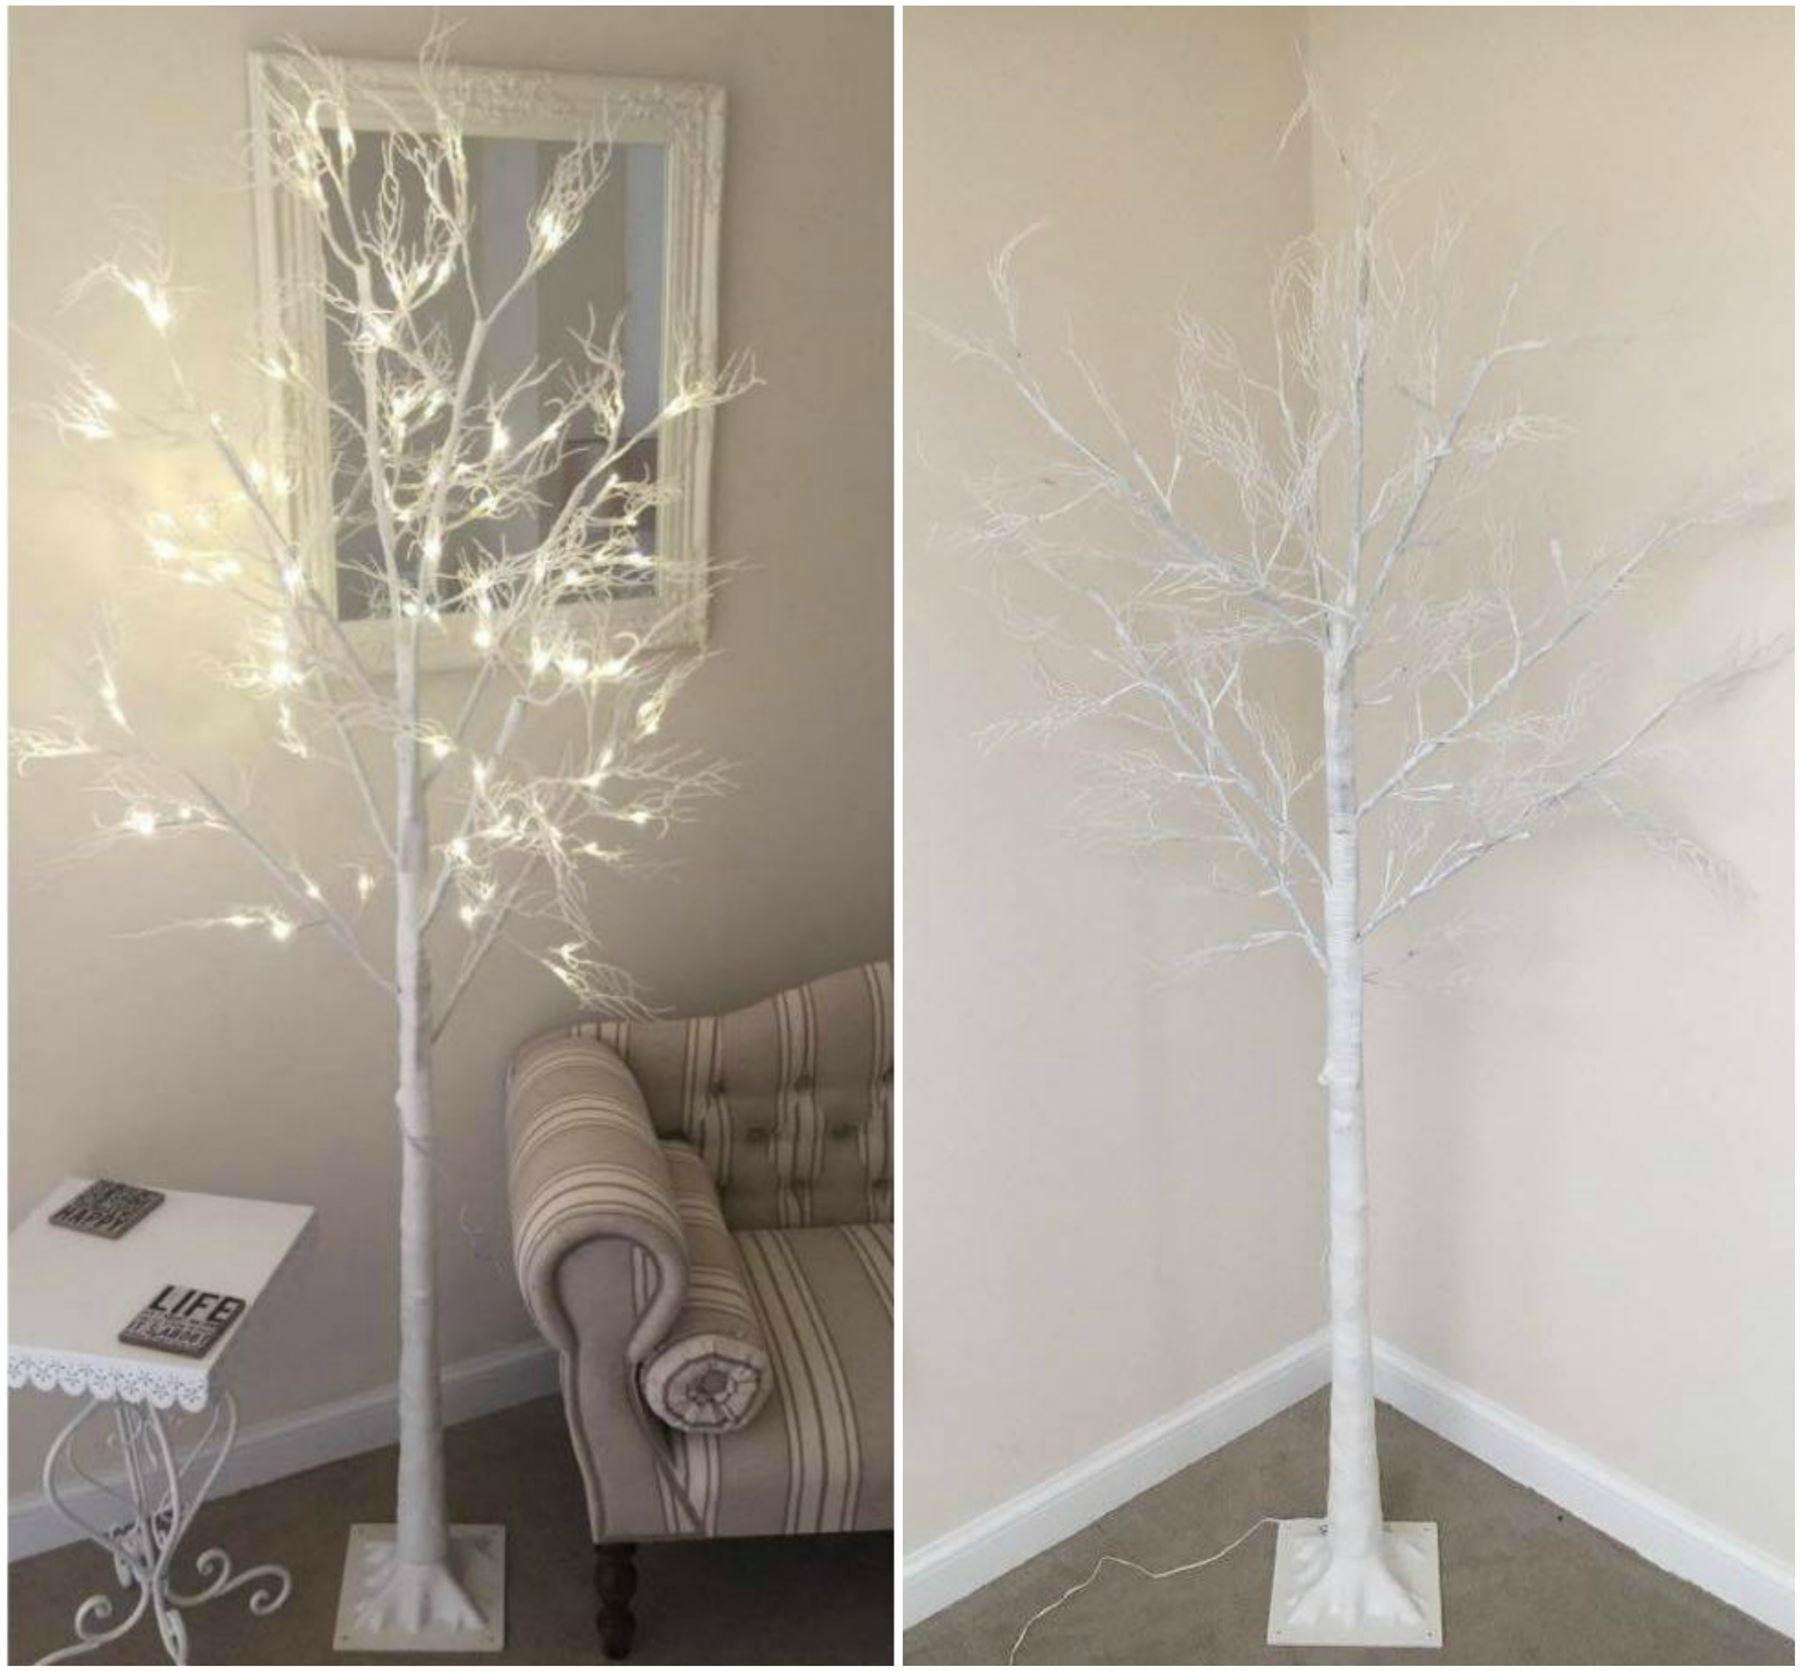 7ft Christmas Twig Tree Pre Lit 120 LED Warm White Lights ...